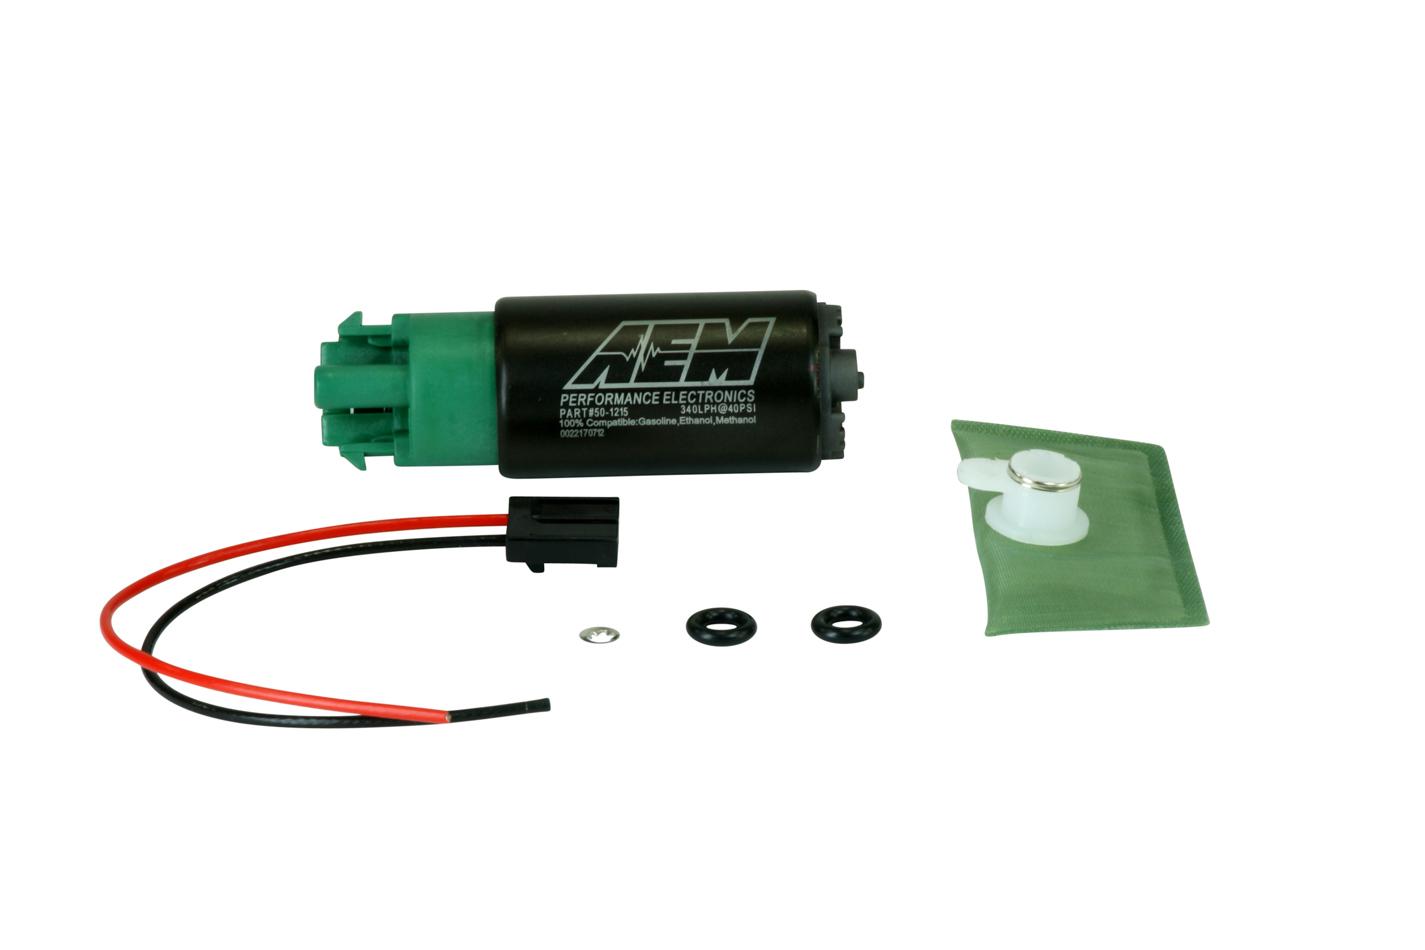 Aem Fuel Pump 340lph E85-Com patible High Flow InTank